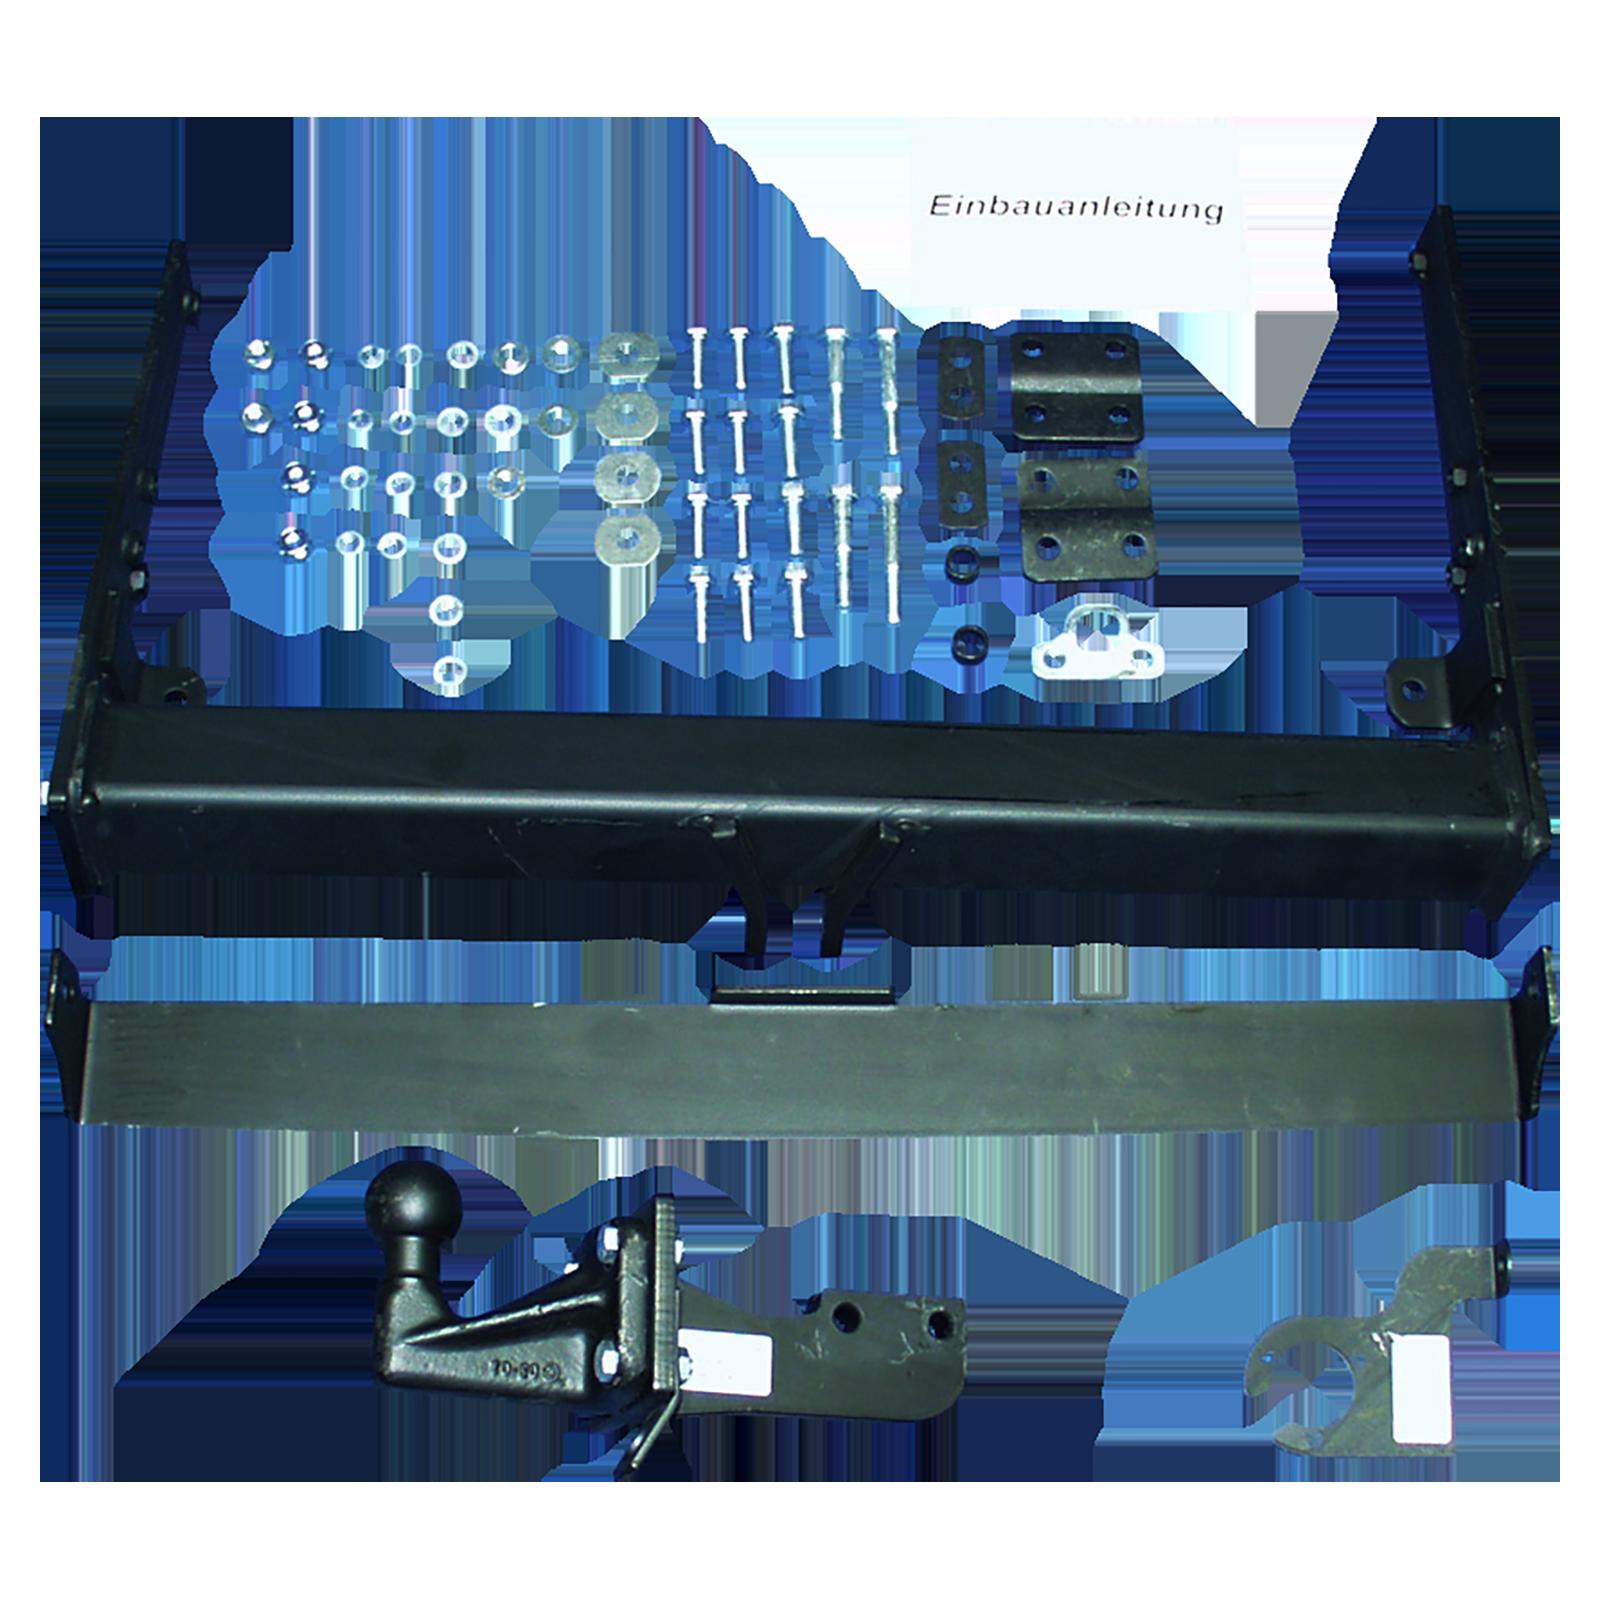 GDW Anhängebock inkl. E Satz 13polig spezifisch Adapter VW TRANSPORTER T5 Kasten